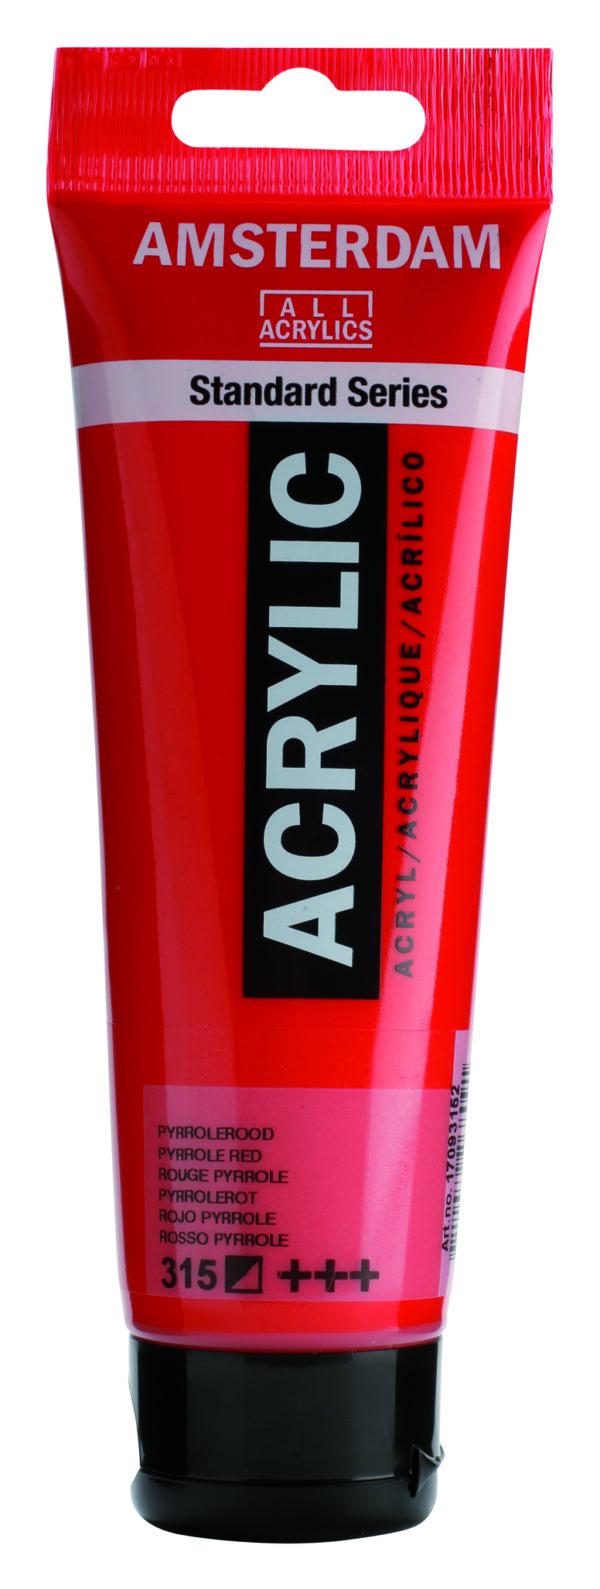 Ams std 315 Pyrrole red - 120 ml